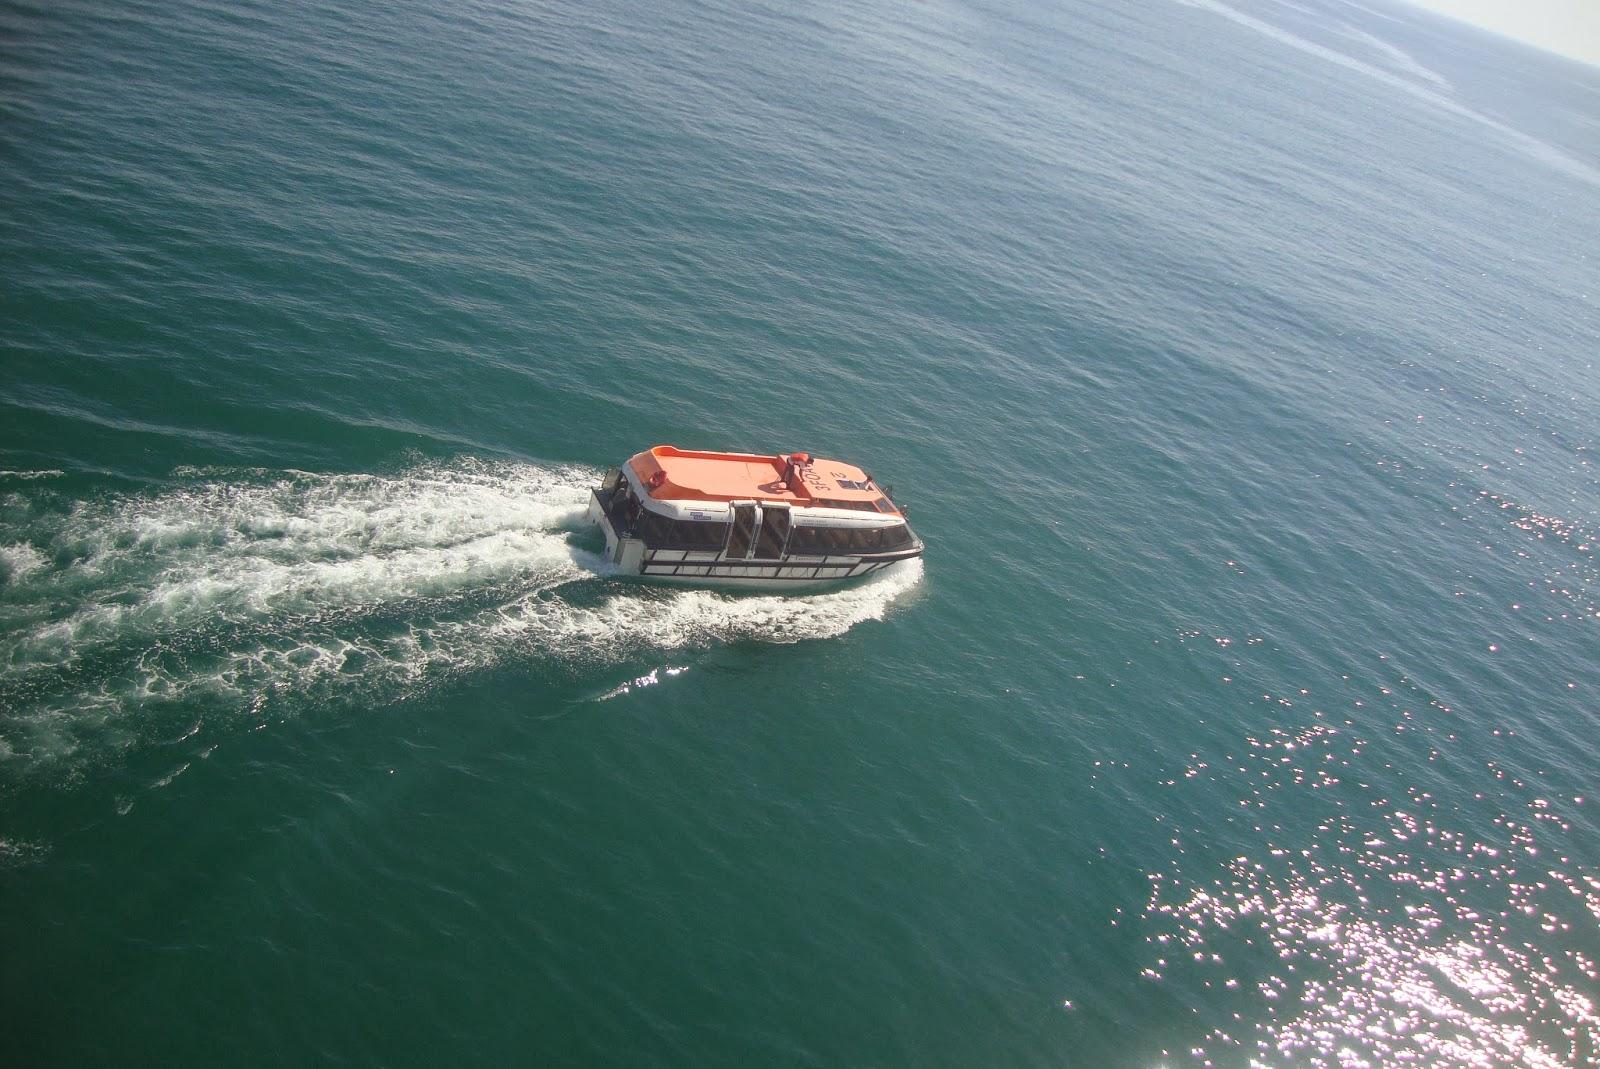 Bote de desembarque em Búzios - RJ - navio MSC Preziosa